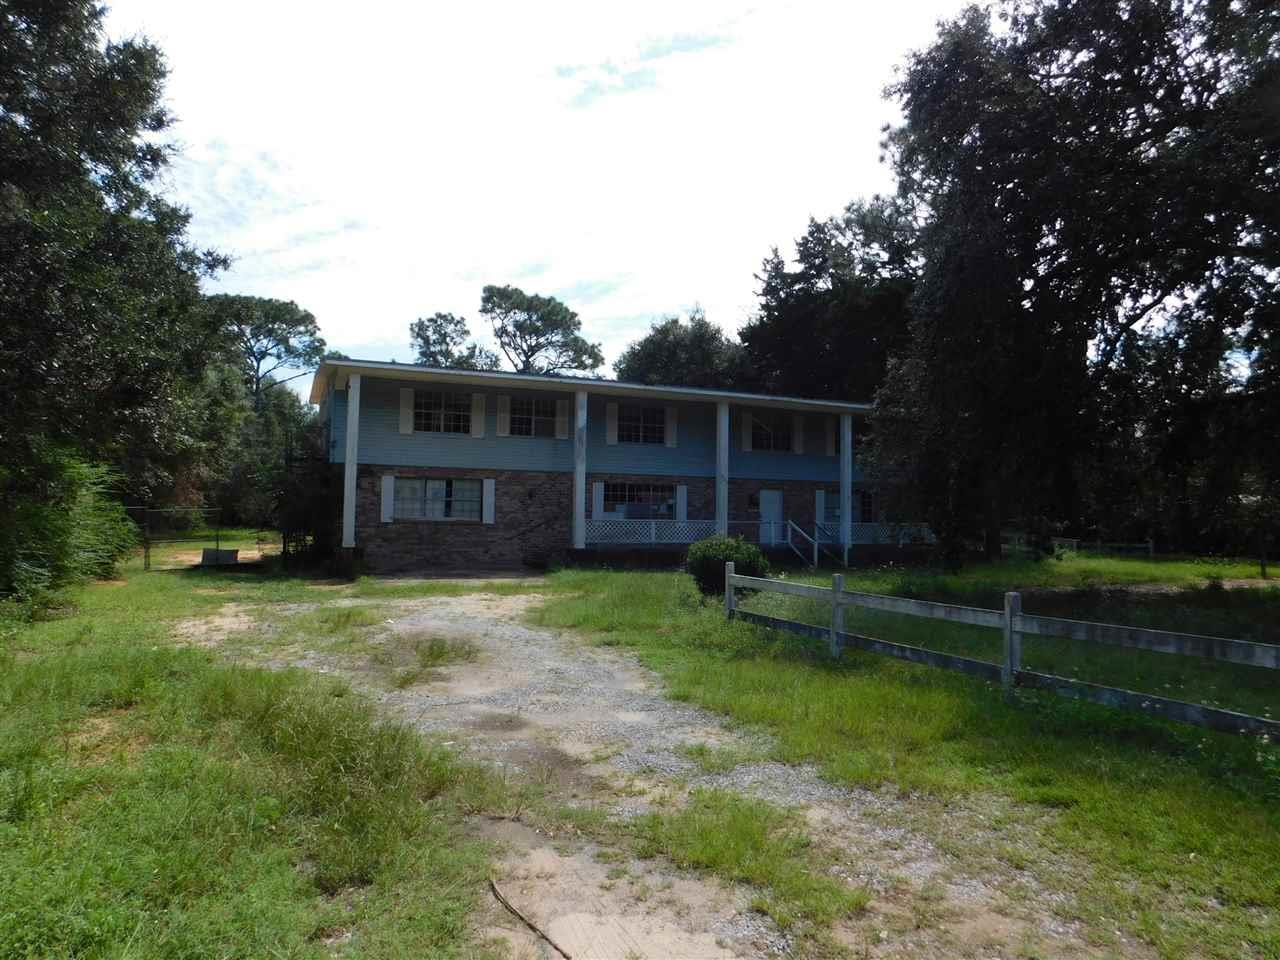 7660 Kipling St, Pensacola, FL 32514